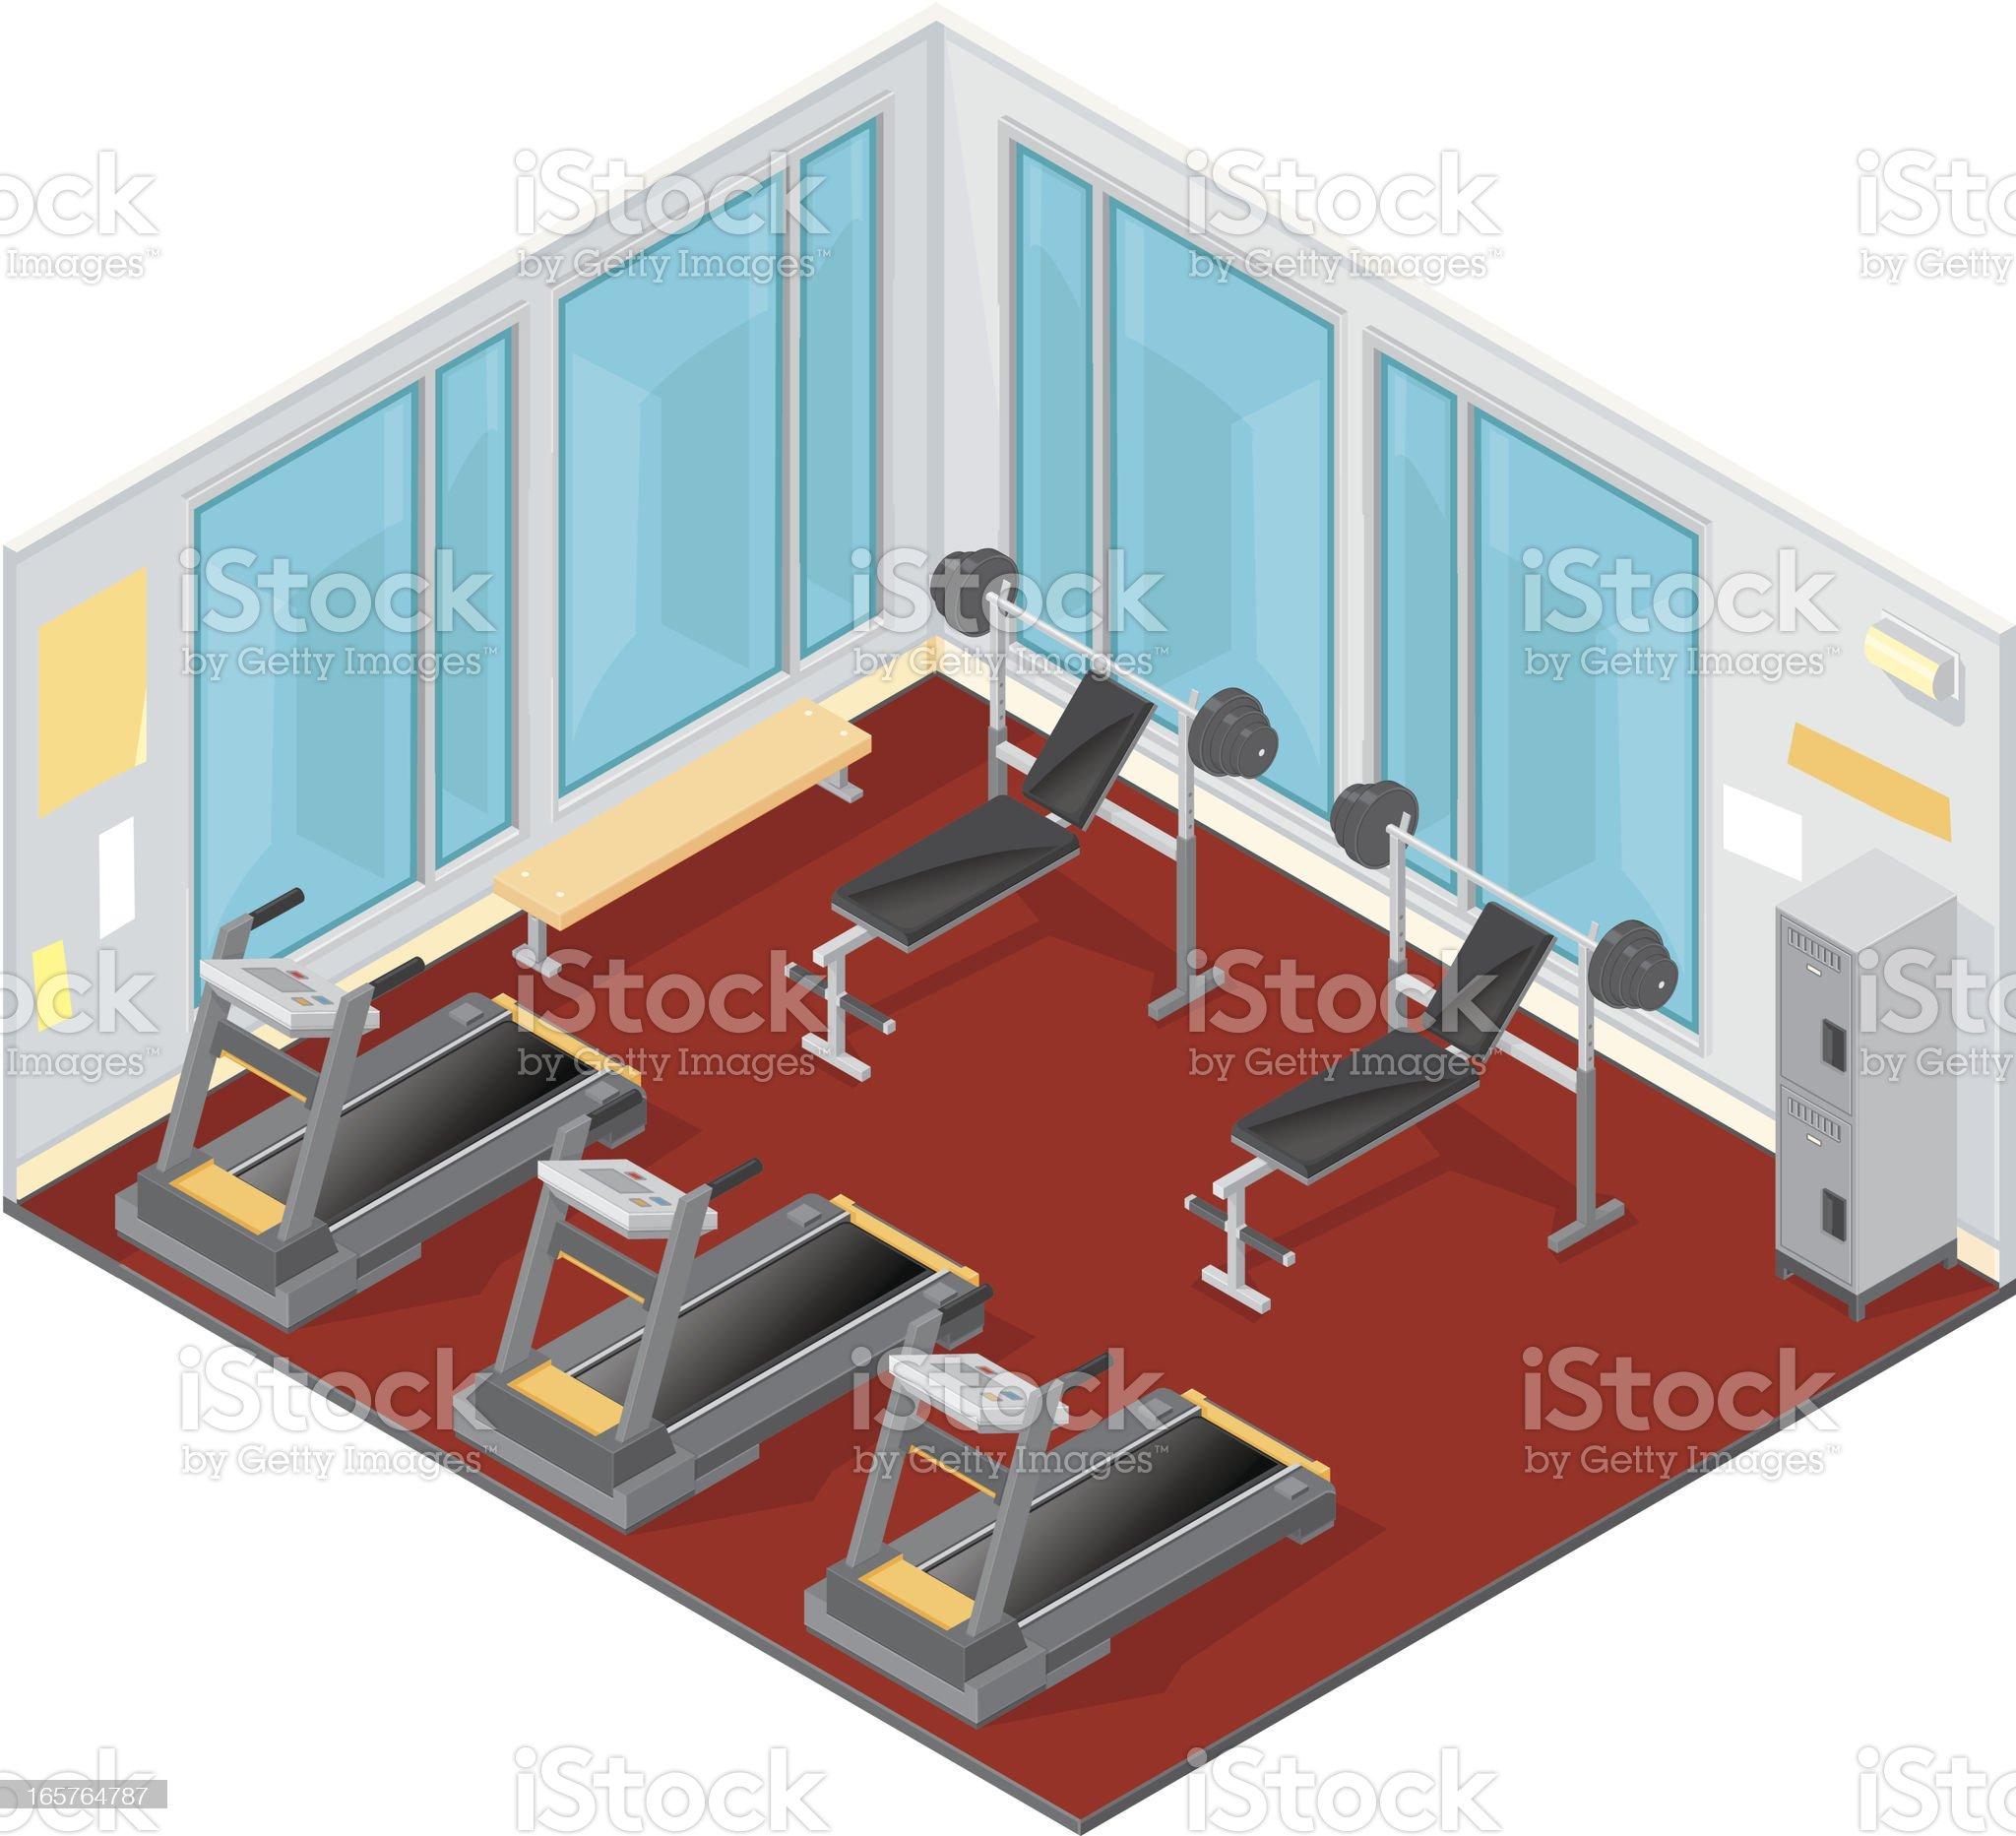 Isometric Gym. royalty-free stock vector art